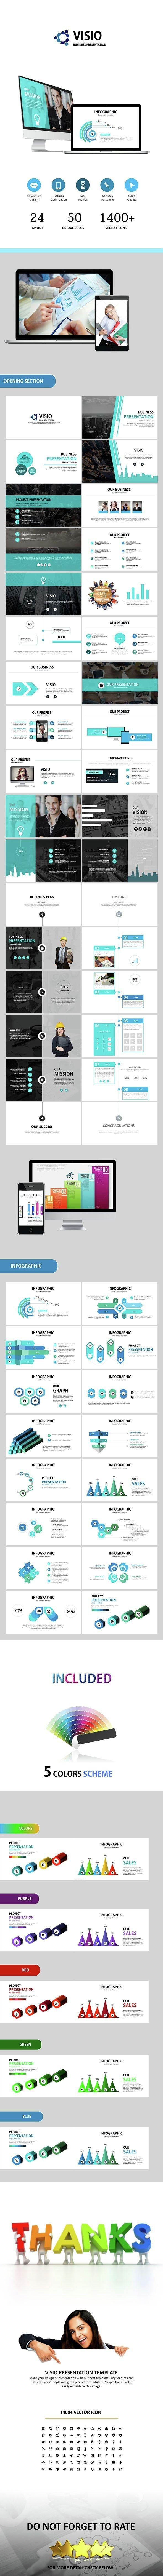 Visio  Google Slides Business Presentation  Best Business